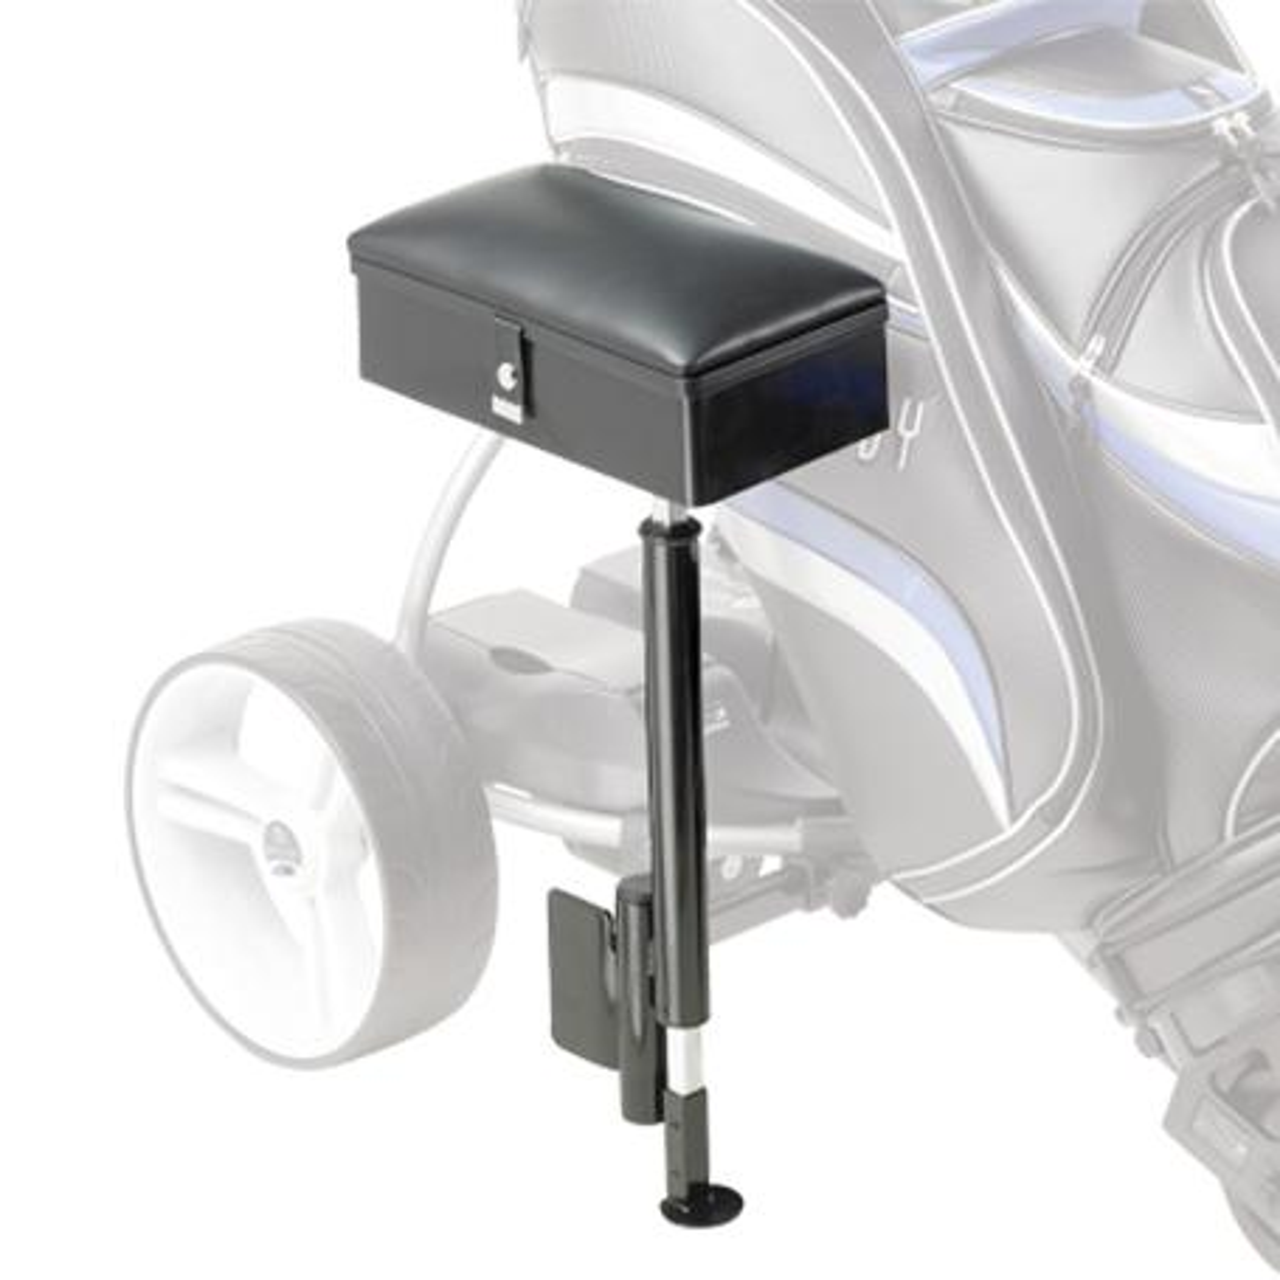 Motocaddy Delux Sits S-serien 0